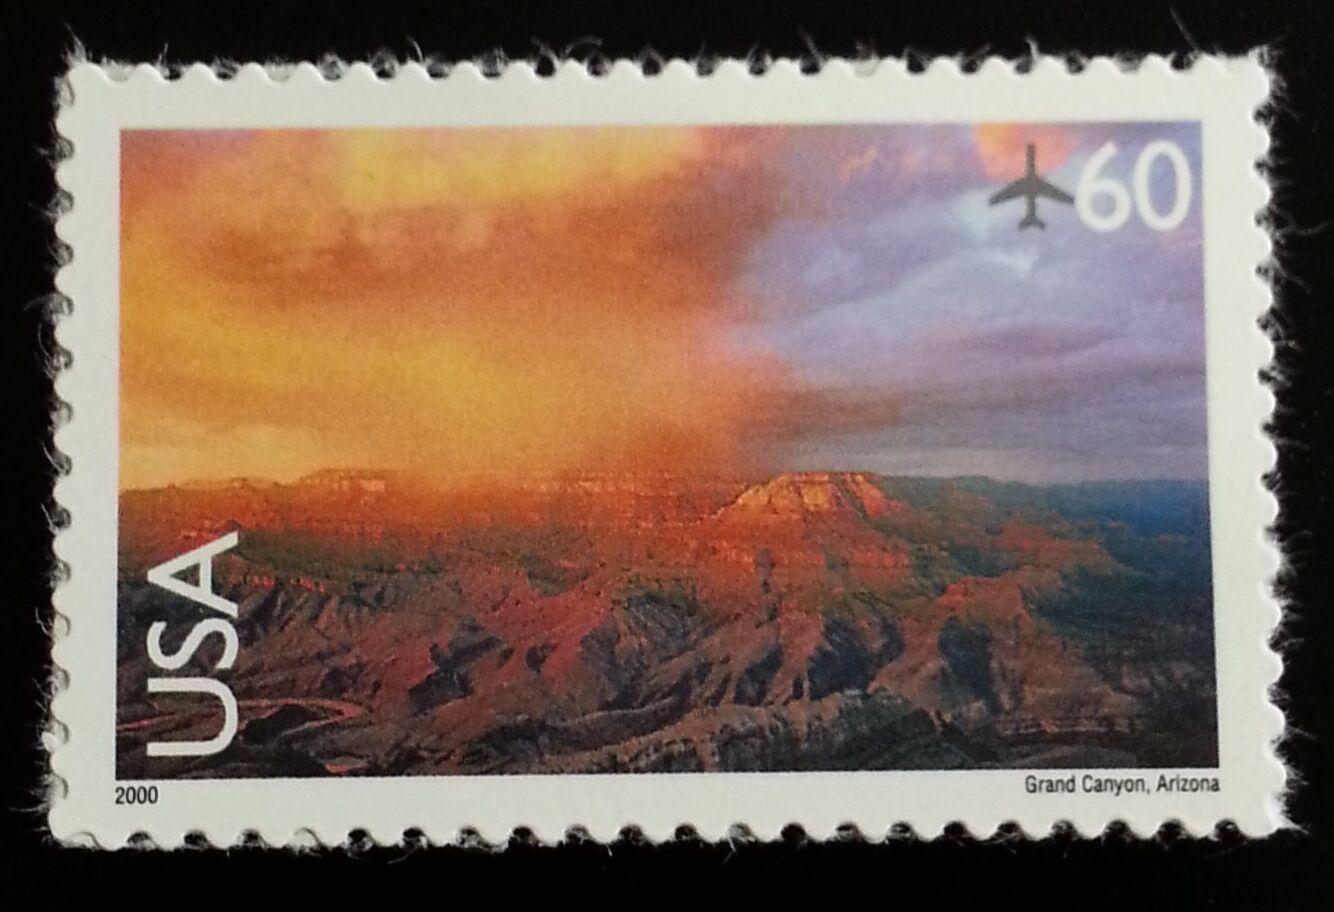 2000 60c Grand Canyon, Arizona Scott C135 Mint F/VF NH